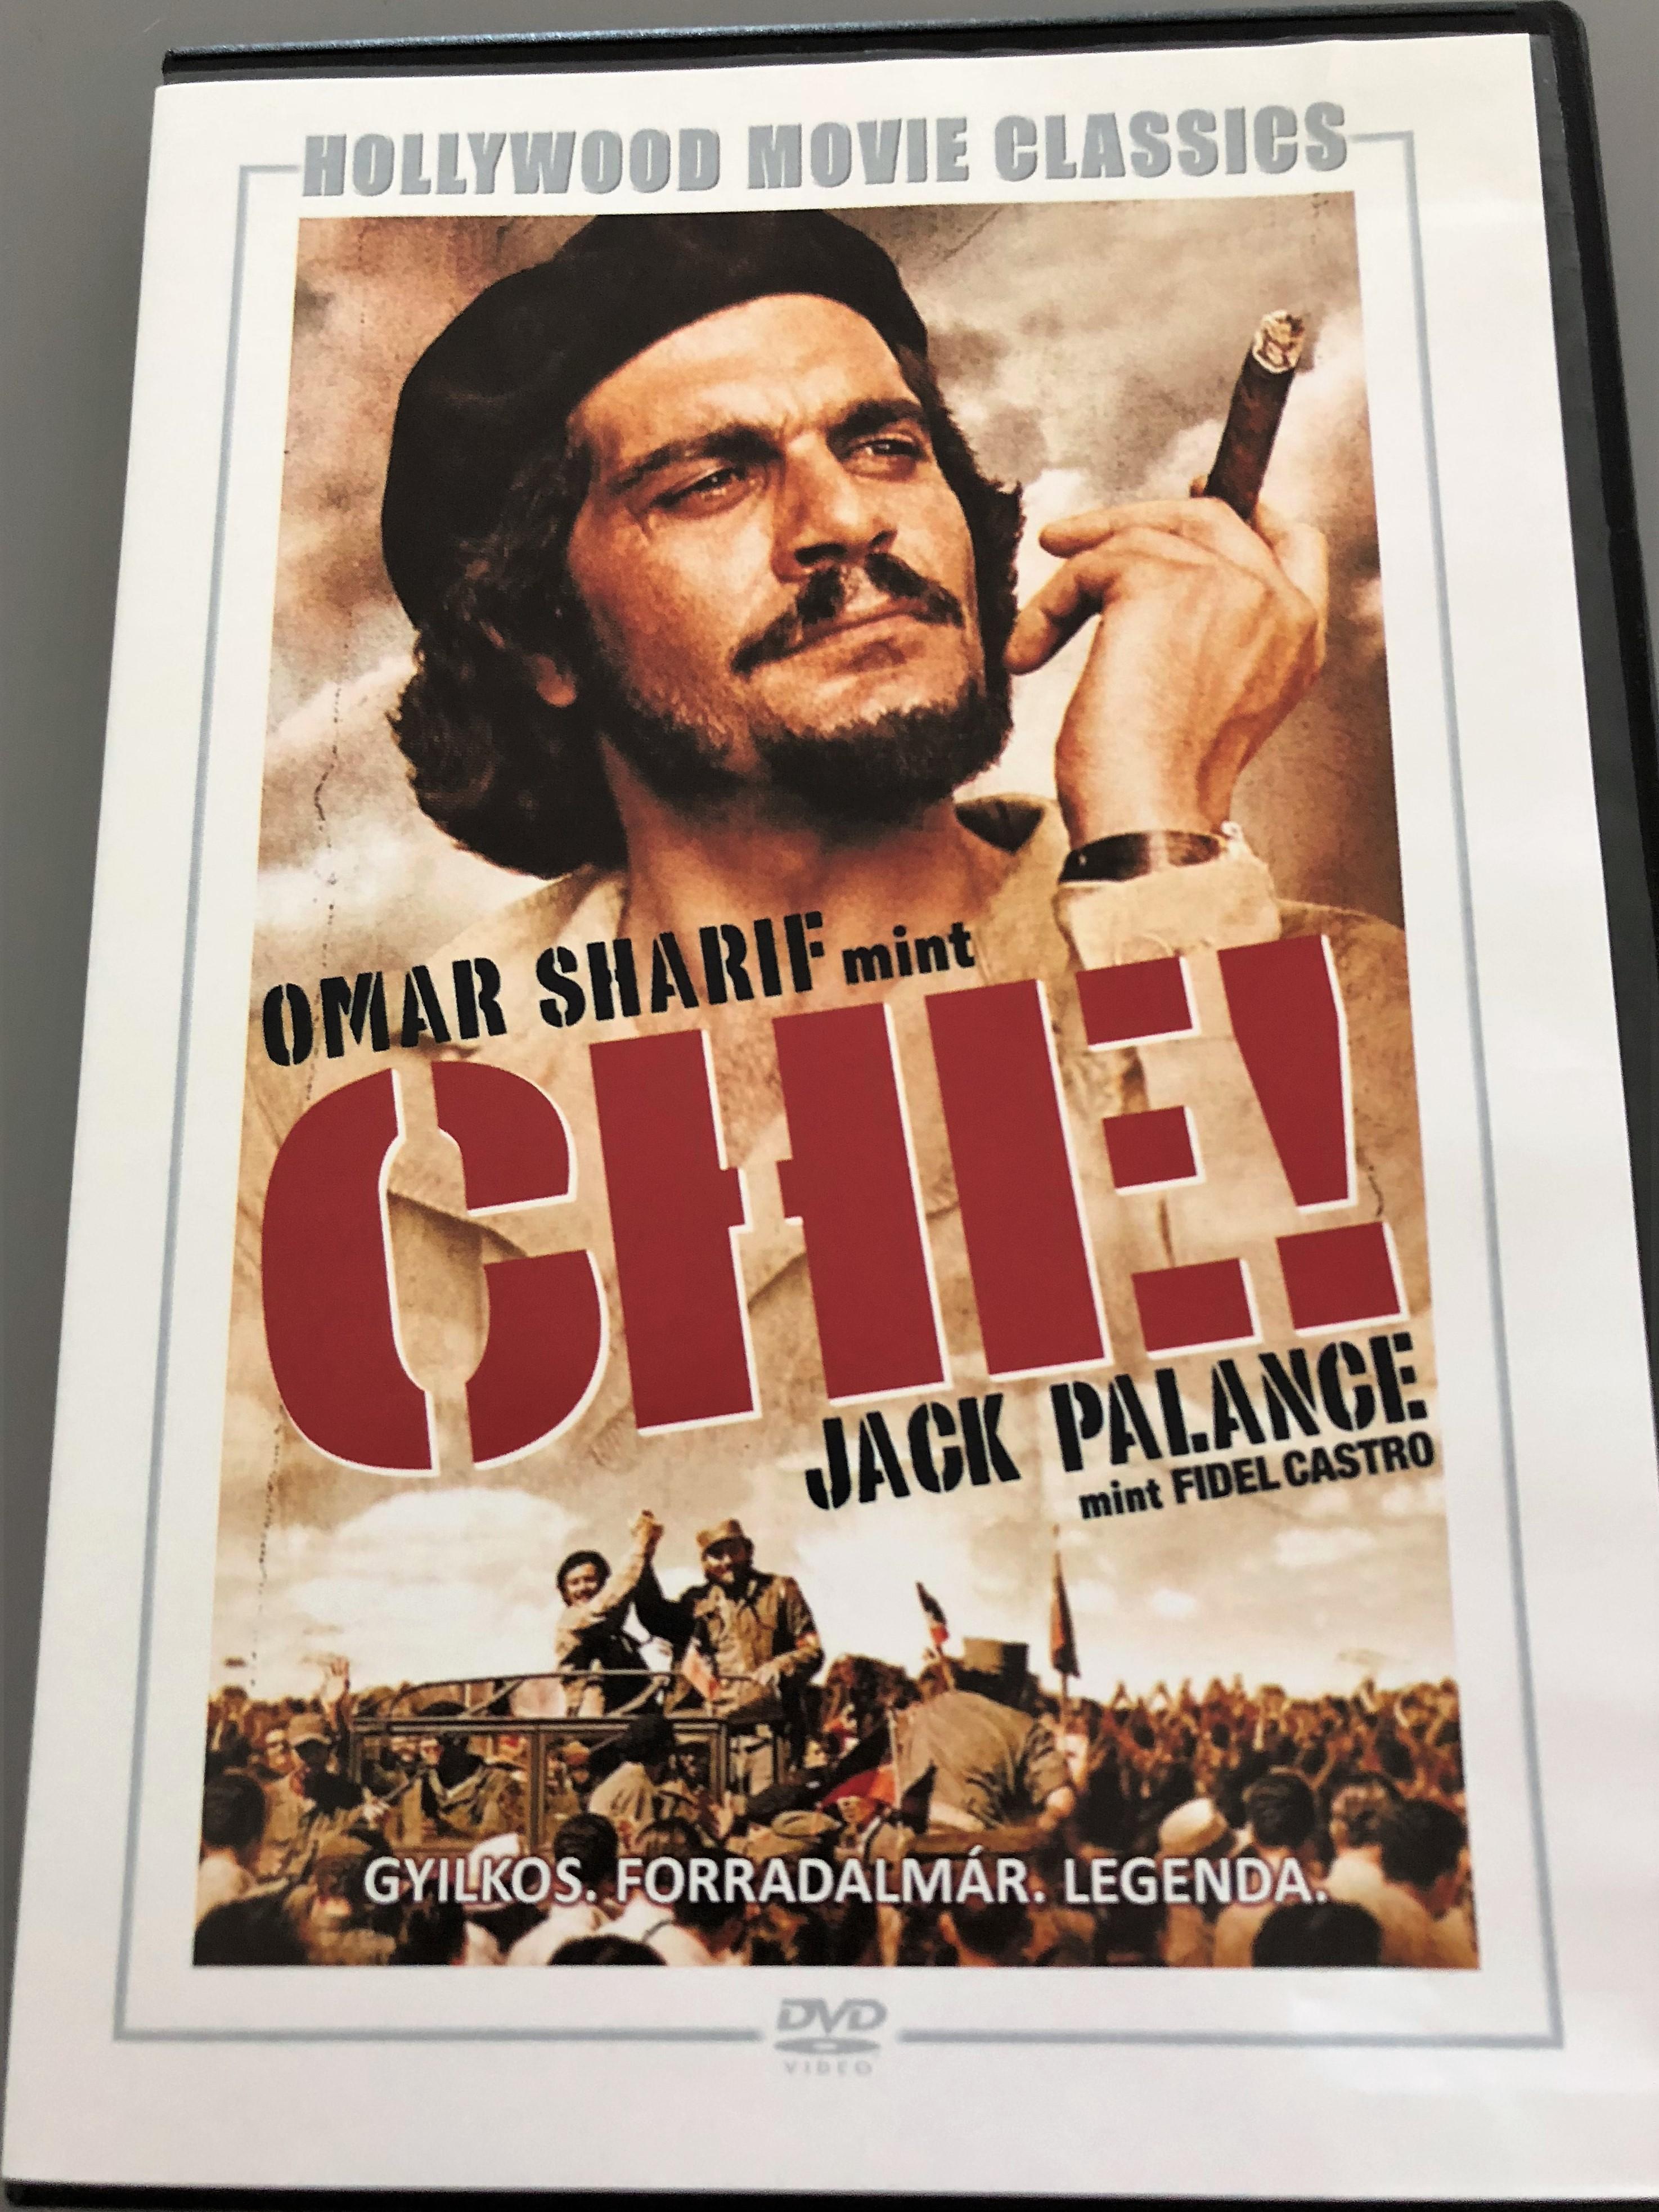 -che-dvd-1969-directed-by-richard-fleischer-starring-omar-sharif-jack-palance-hollywood-movie-classics-gyilkos.-forradalm-r.-legenda-1-.jpg